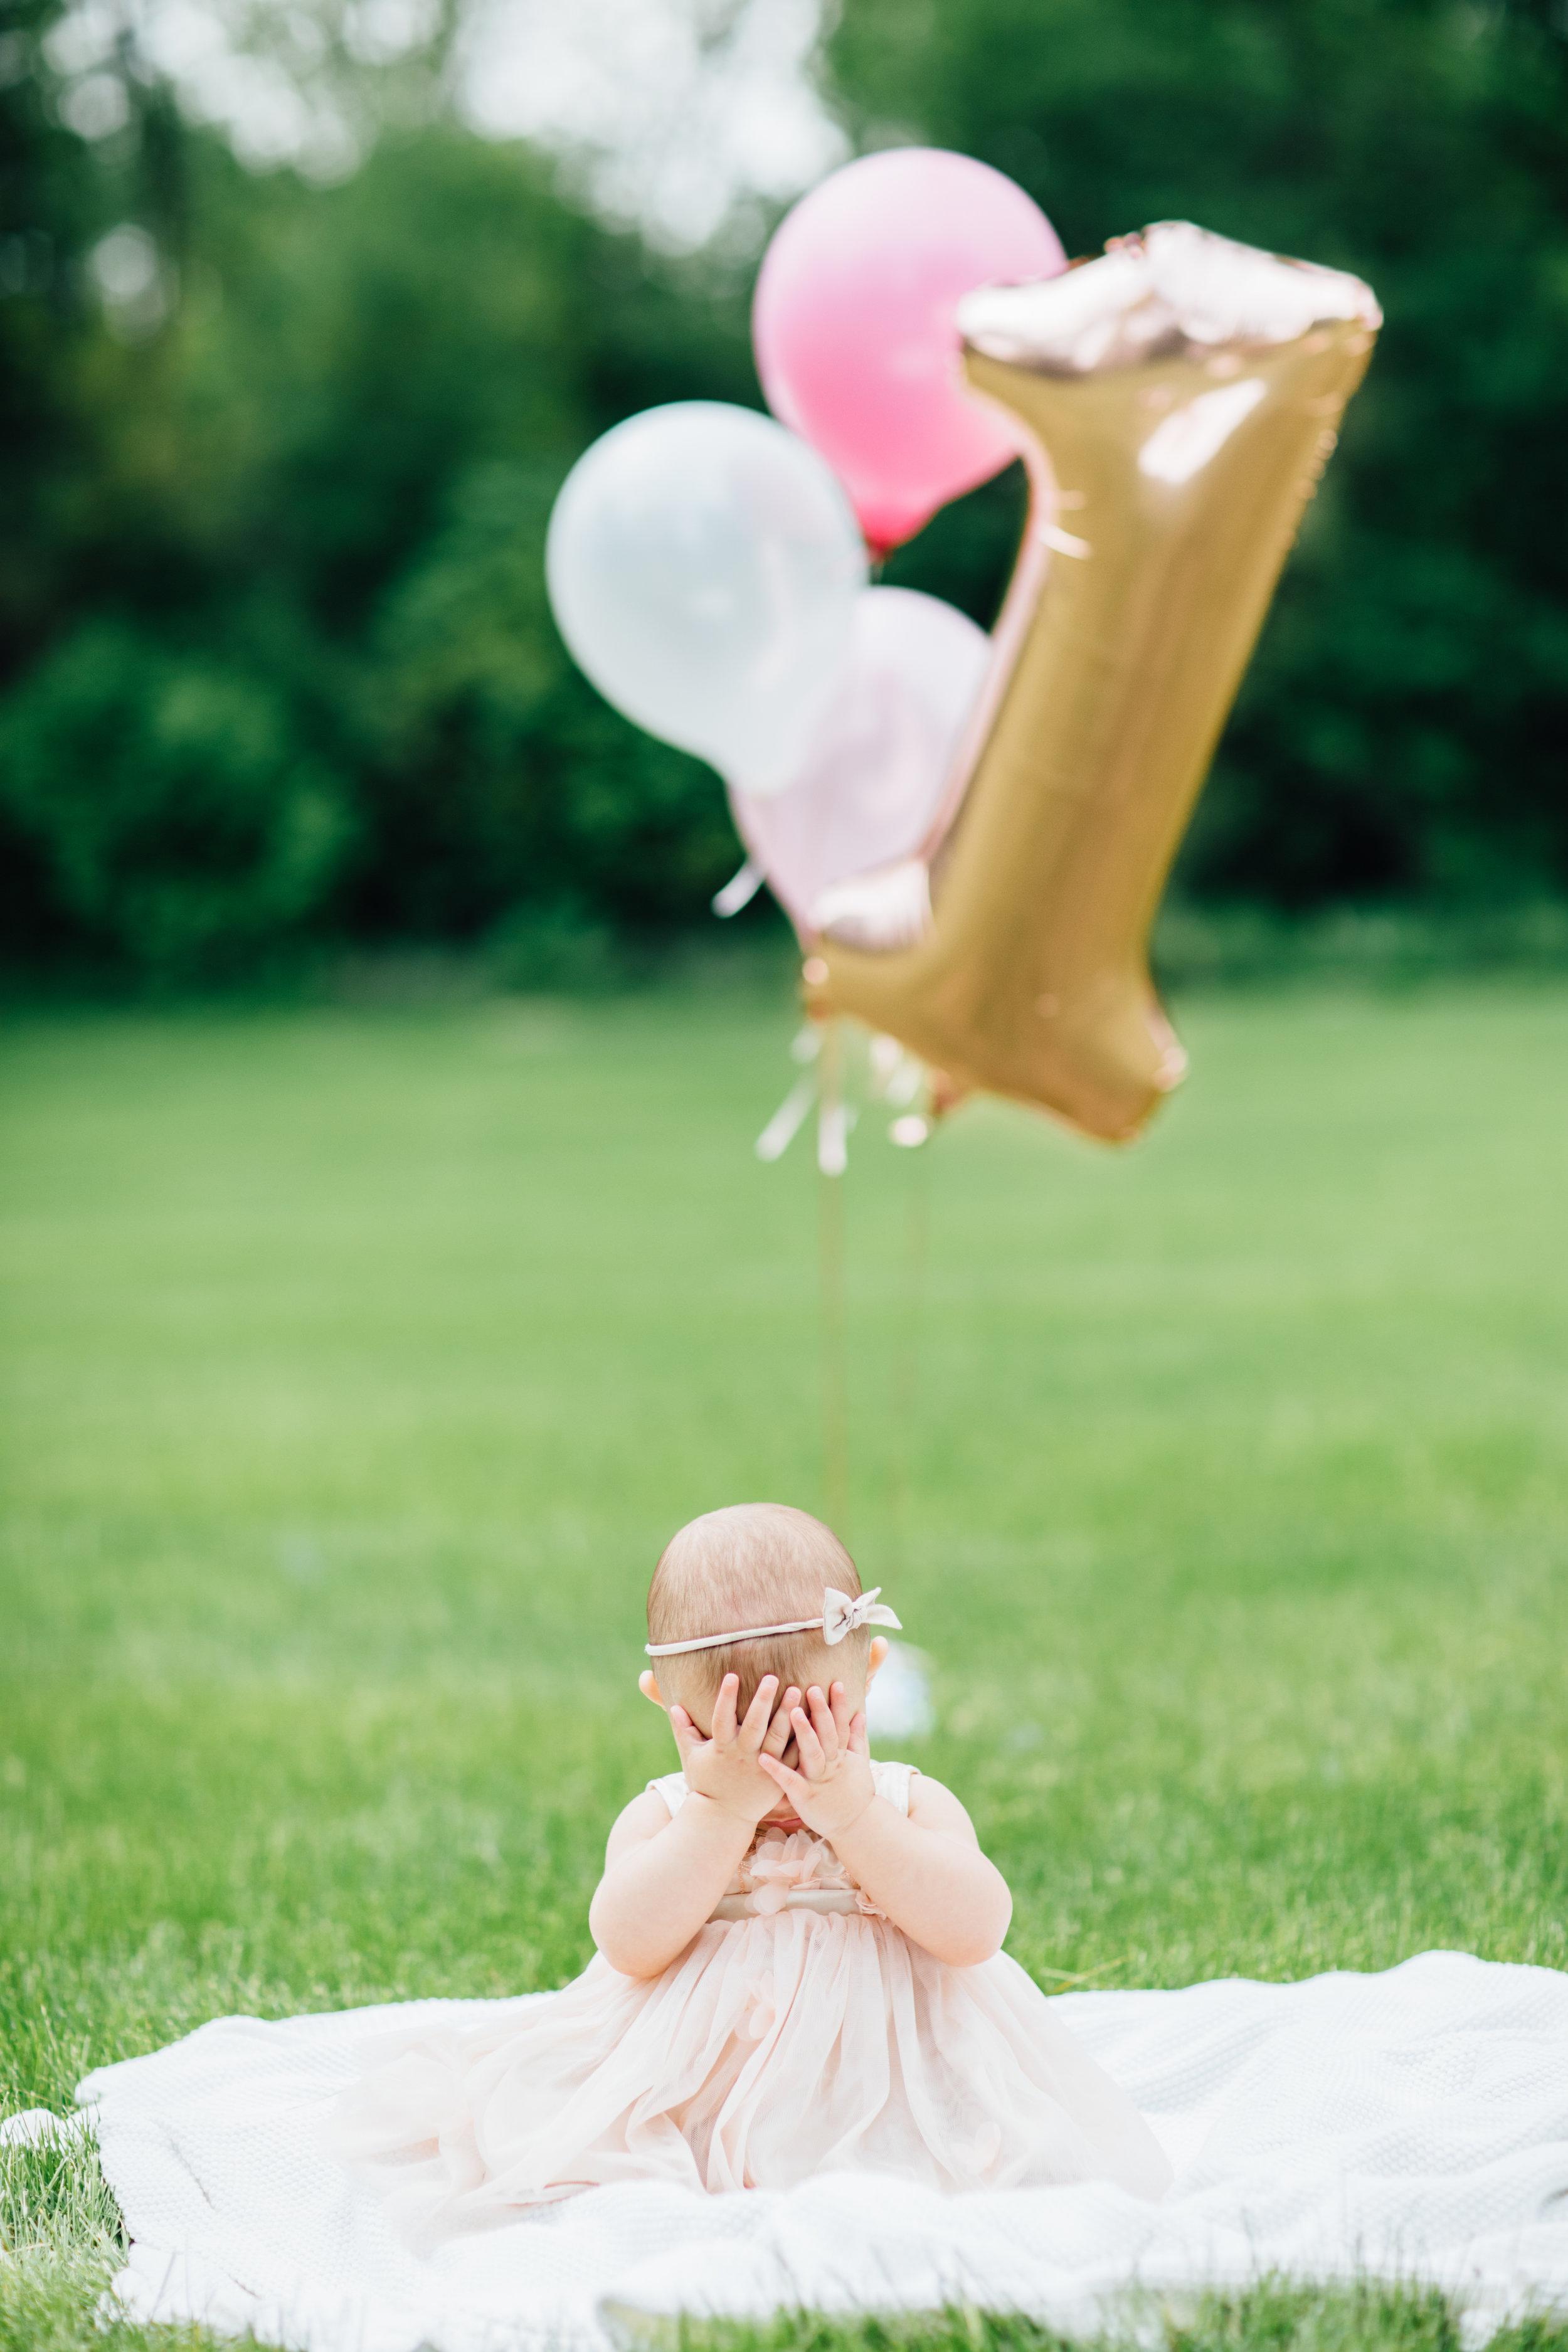 cathy_bosco_baby_G_one_year-164-2.jpg